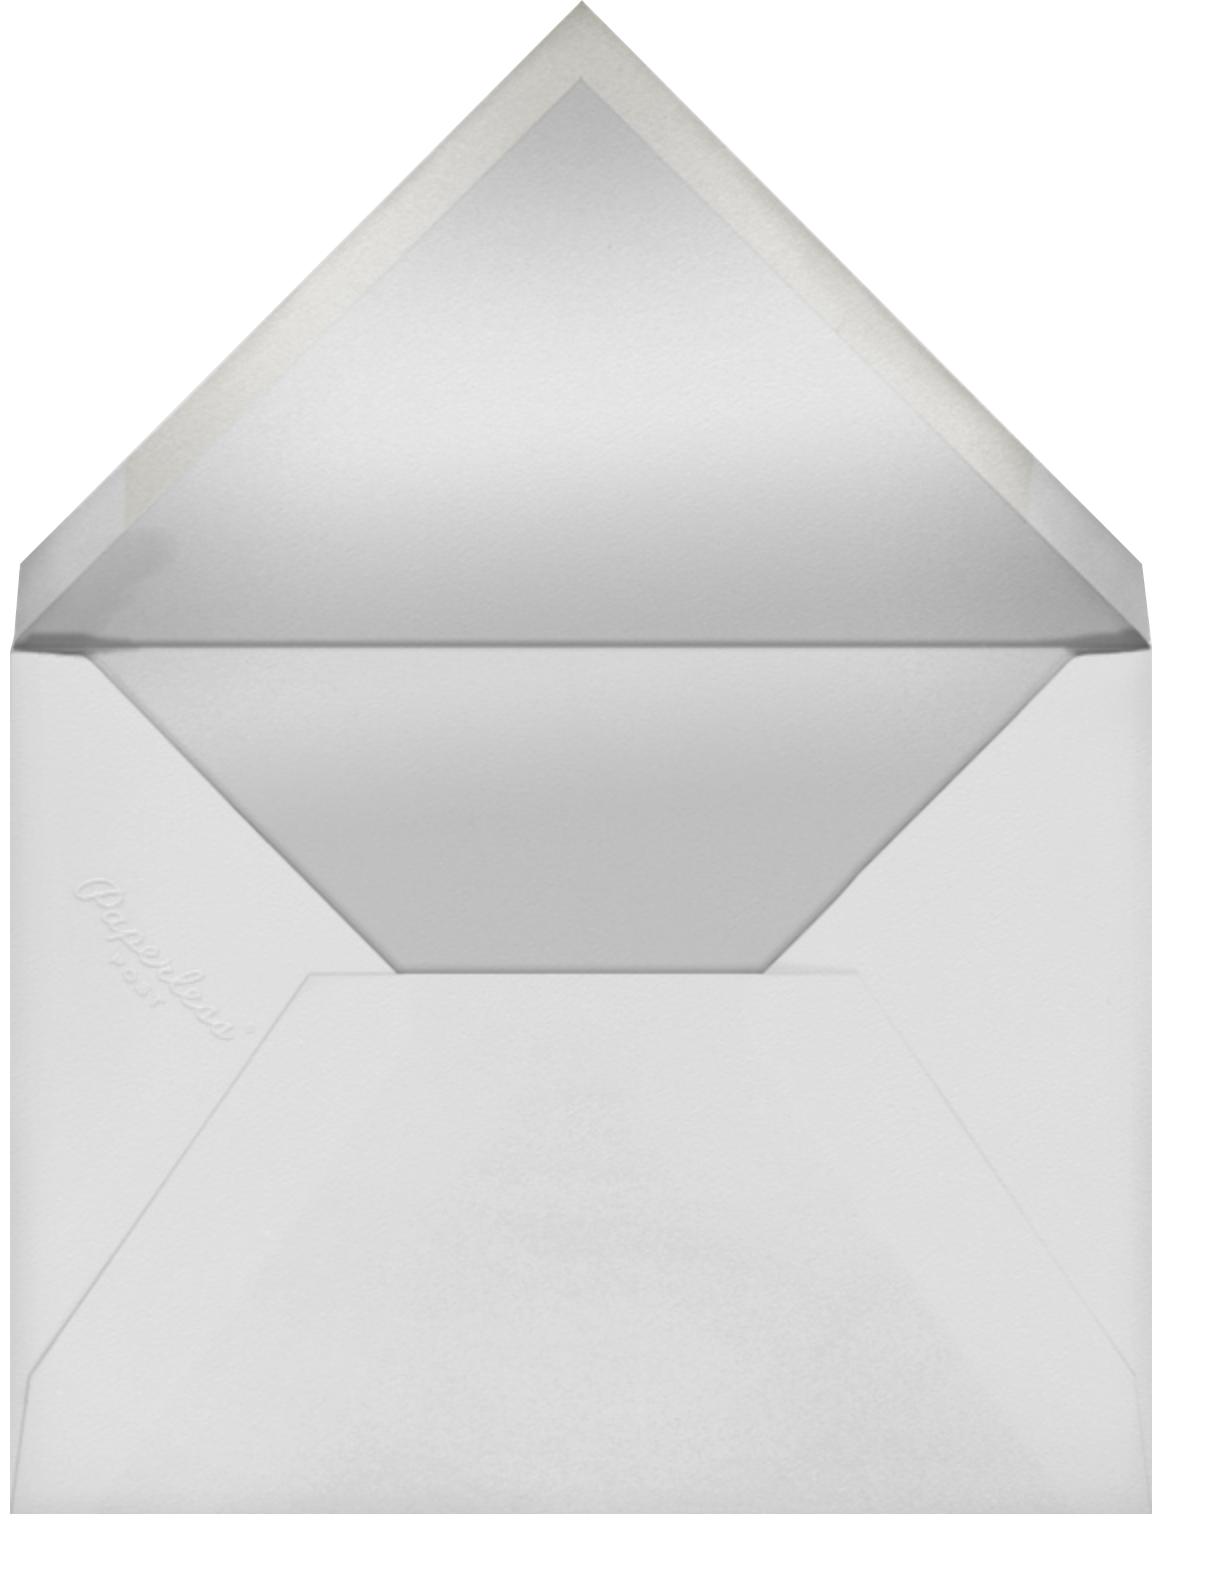 Lamplit (Menu) - Mr. Boddington's Studio - Menus - envelope back